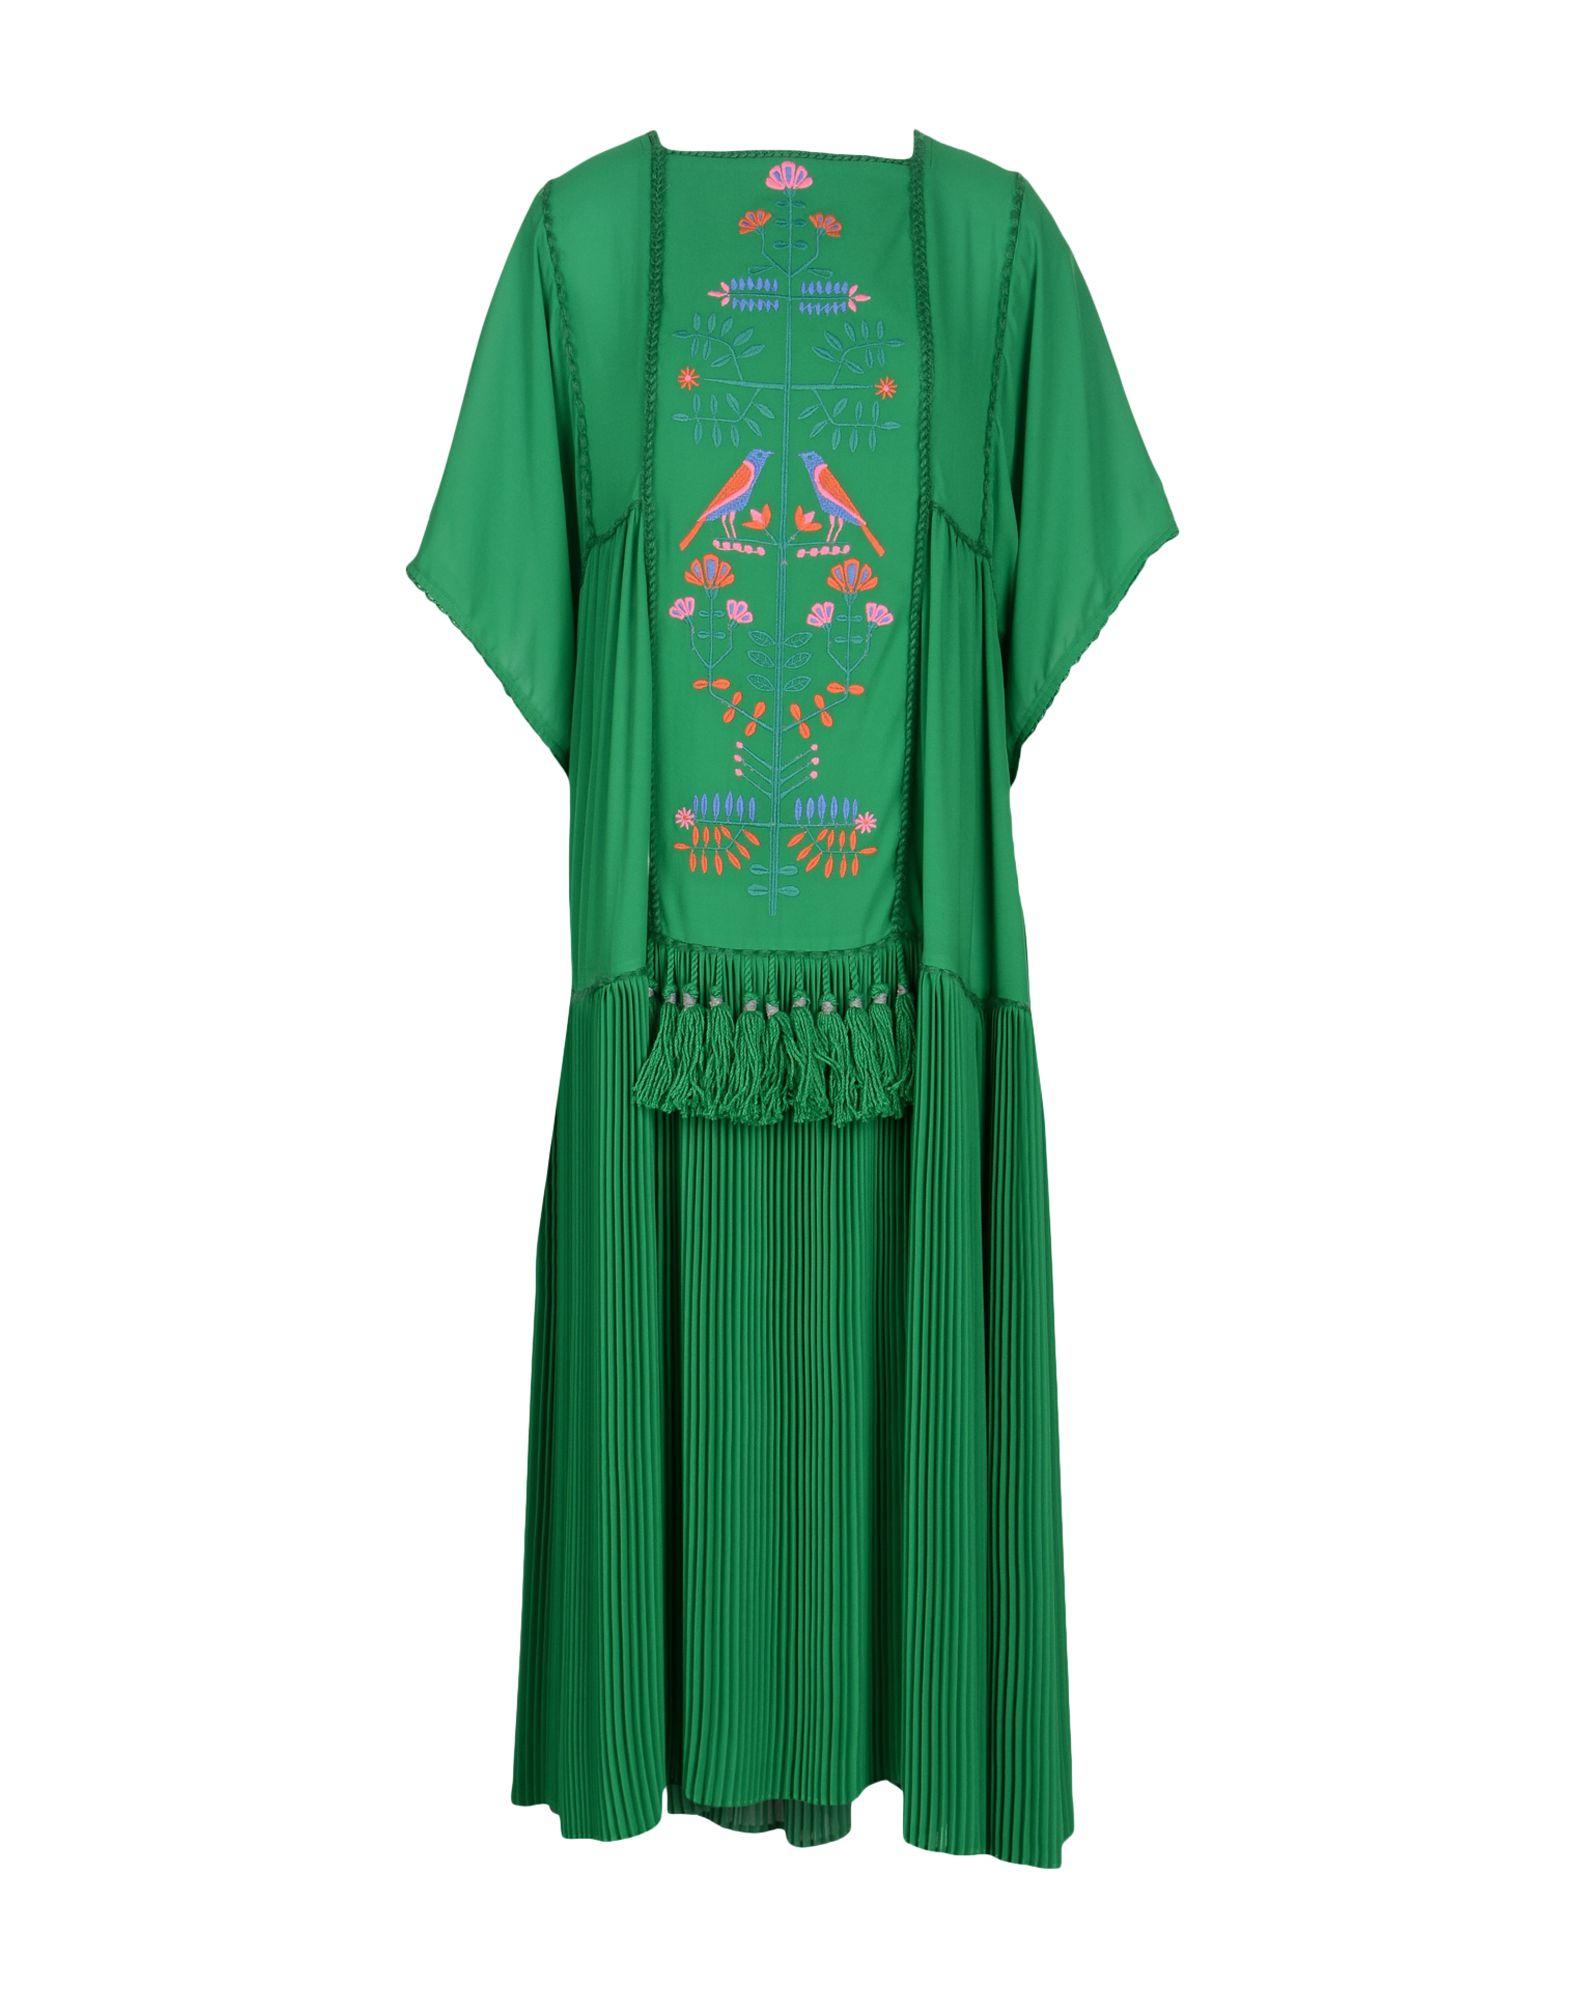 VERONIQUE BRANQUINHO Платье длиной 3/4 розетка 1 пост комп rj45 schneider electric glossa кат 5 алюминий